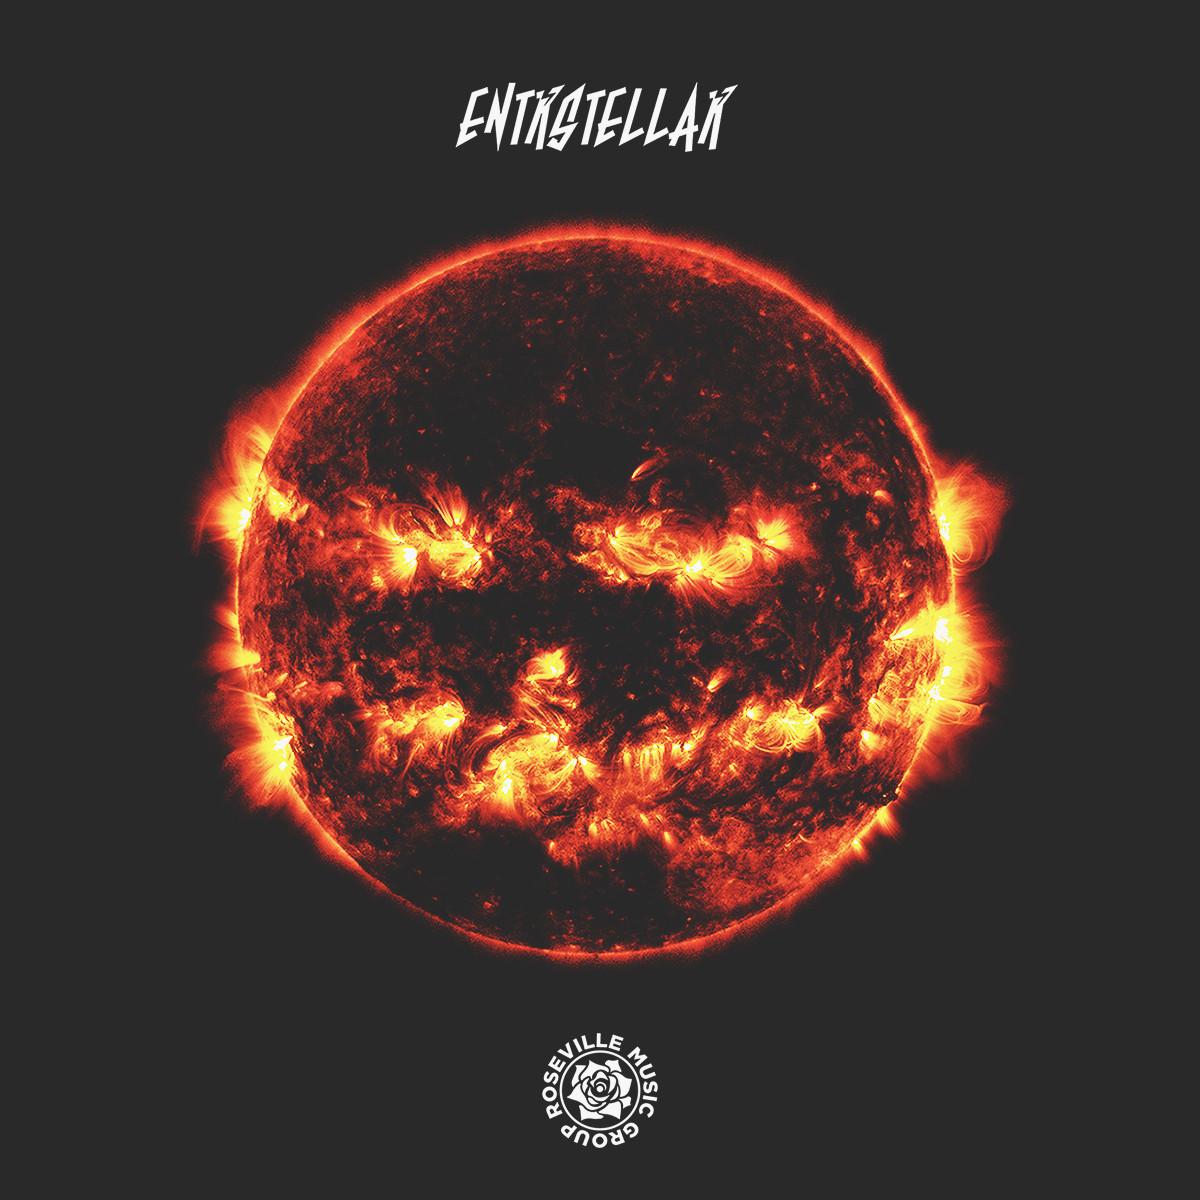 ENTRSTELLAR - Dark Sun [RMG EXCLUSIVE]